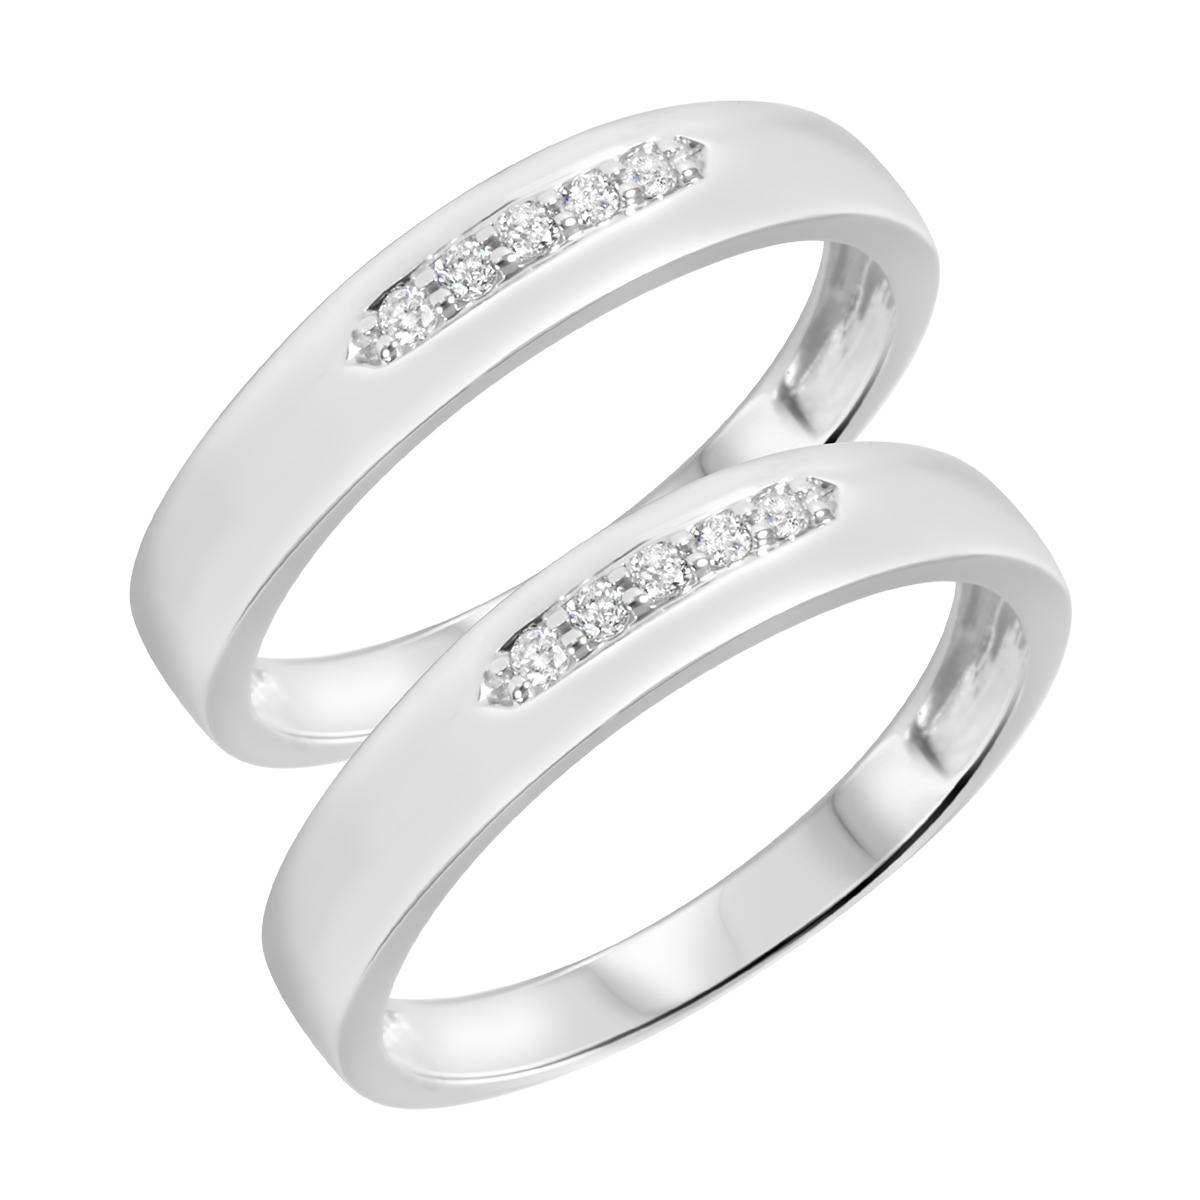 1/5 CT. T.W. Round Cut Mens  Same Sex Wedding Band Set 14K White Gold- Size 8